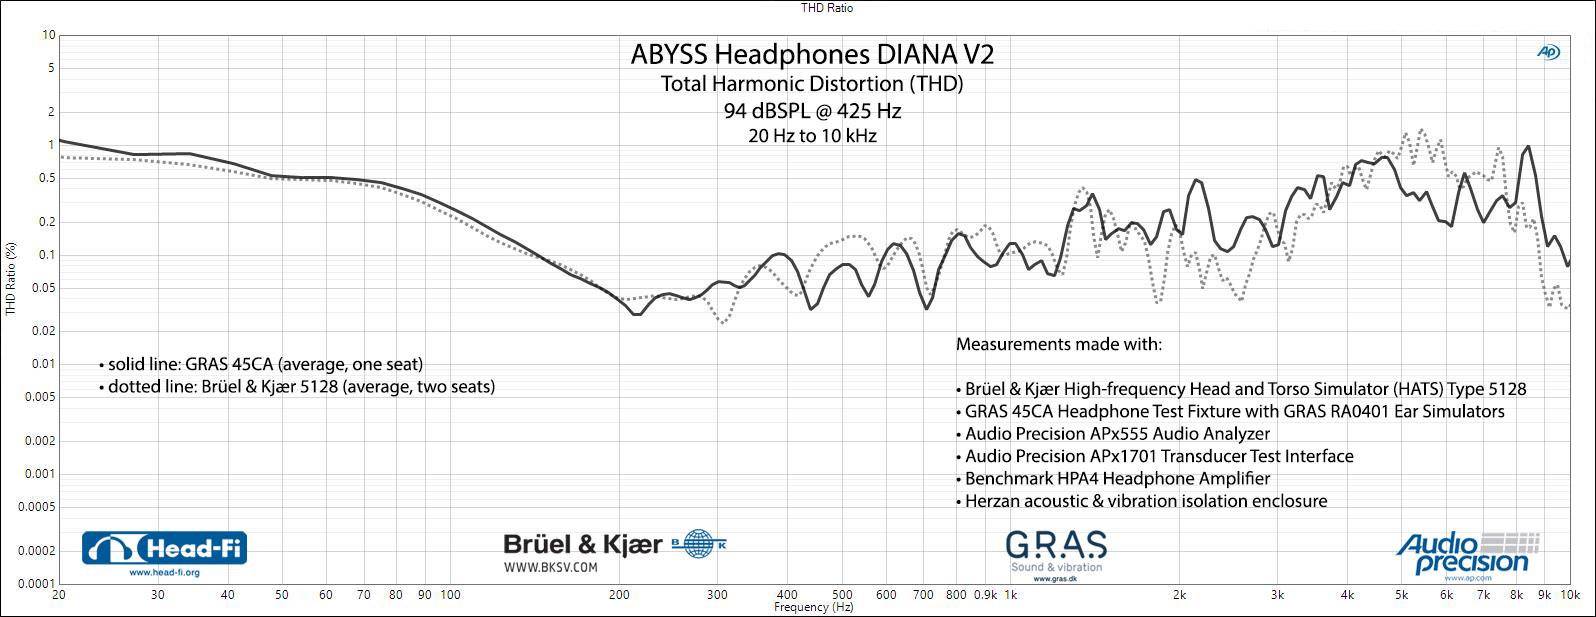 Abyss-Headphones-Diana-V2---THD---94-dBSPL-425-Hz---5128-and-45CA.jpg